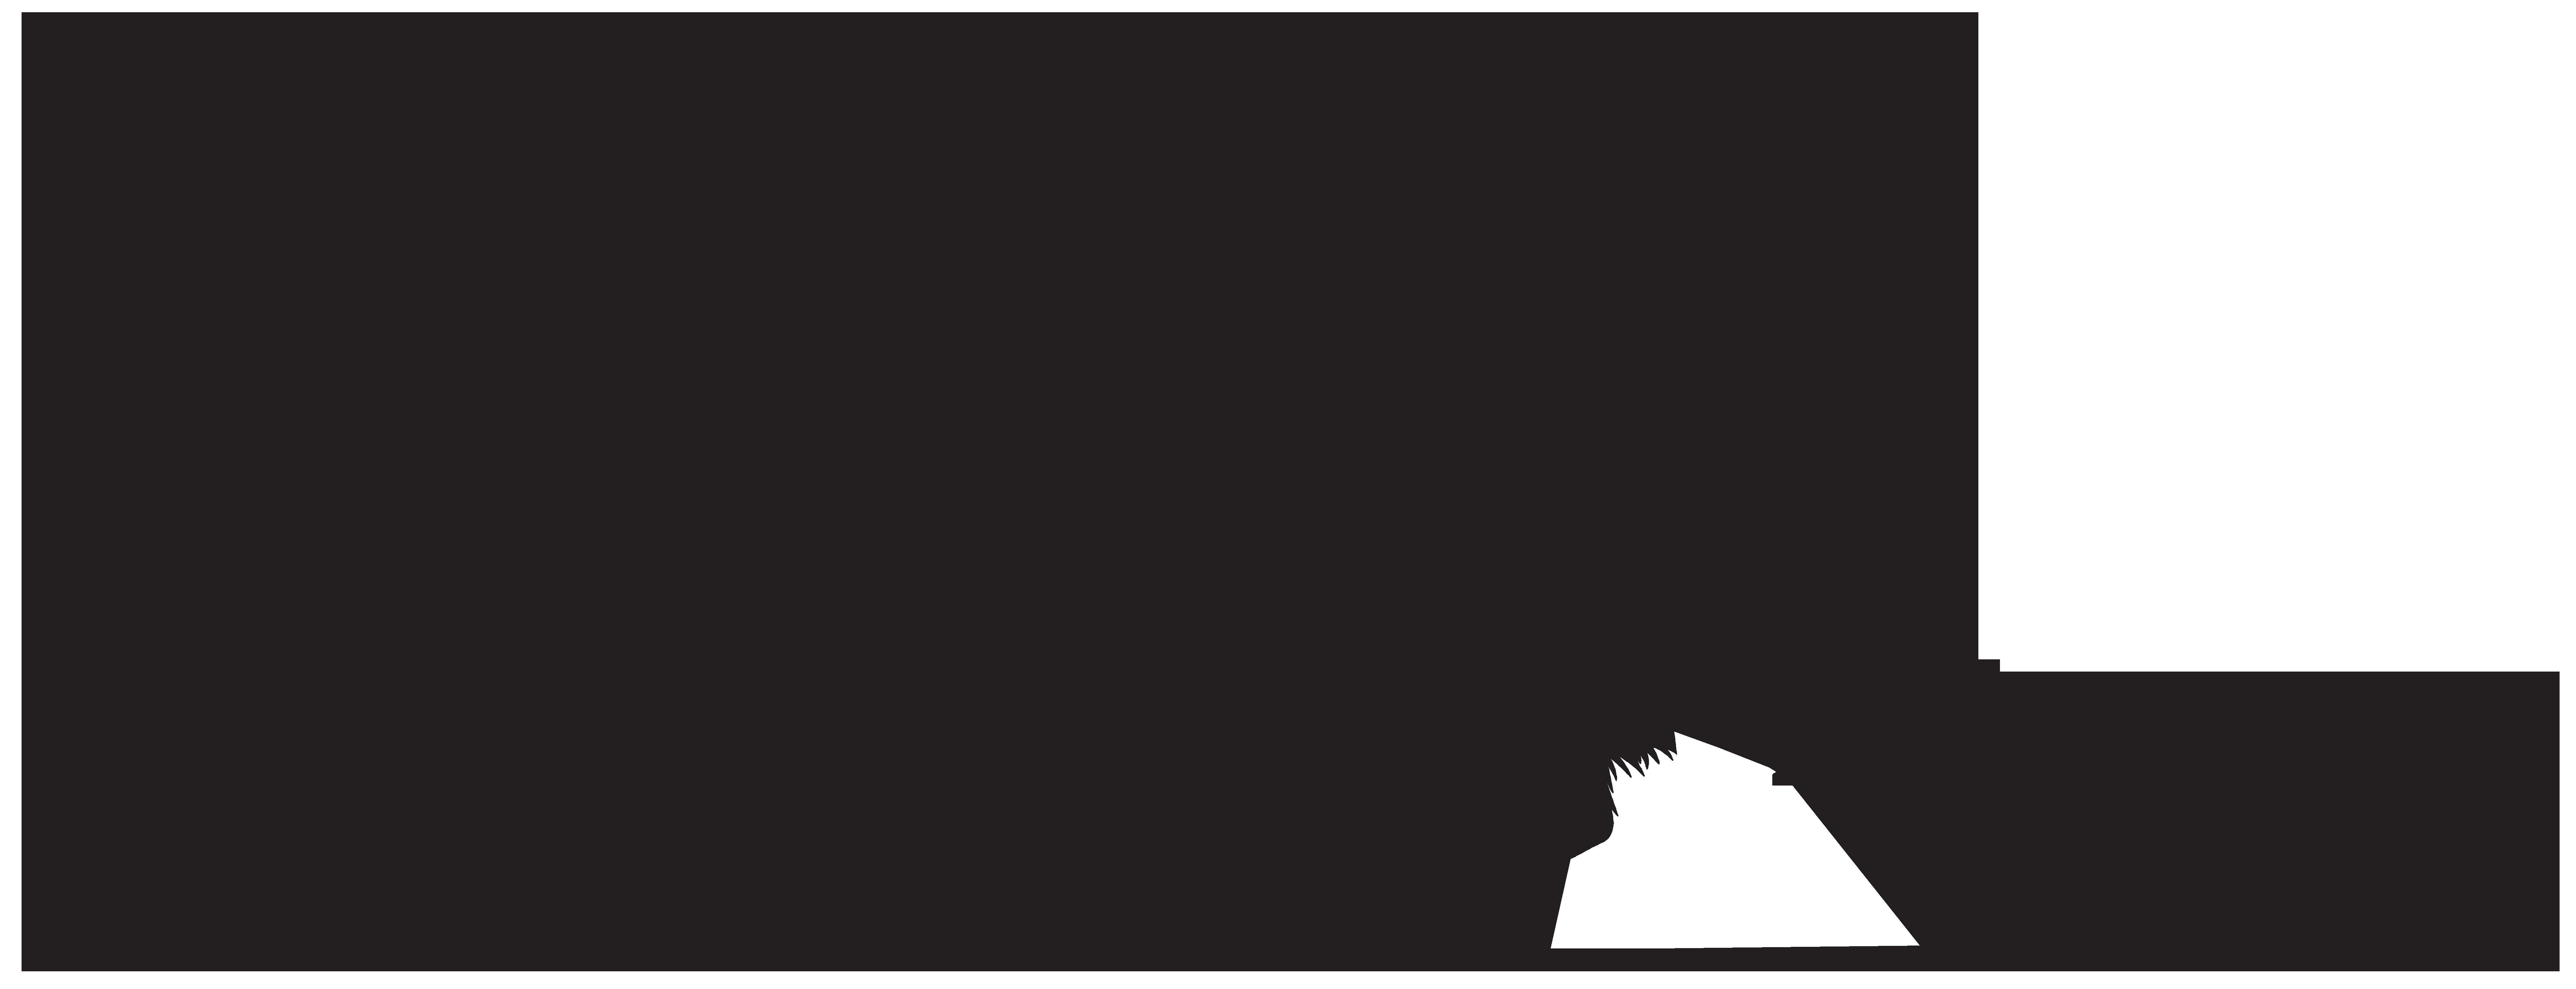 Silhouette png clip art. Beaver clipart transparent background